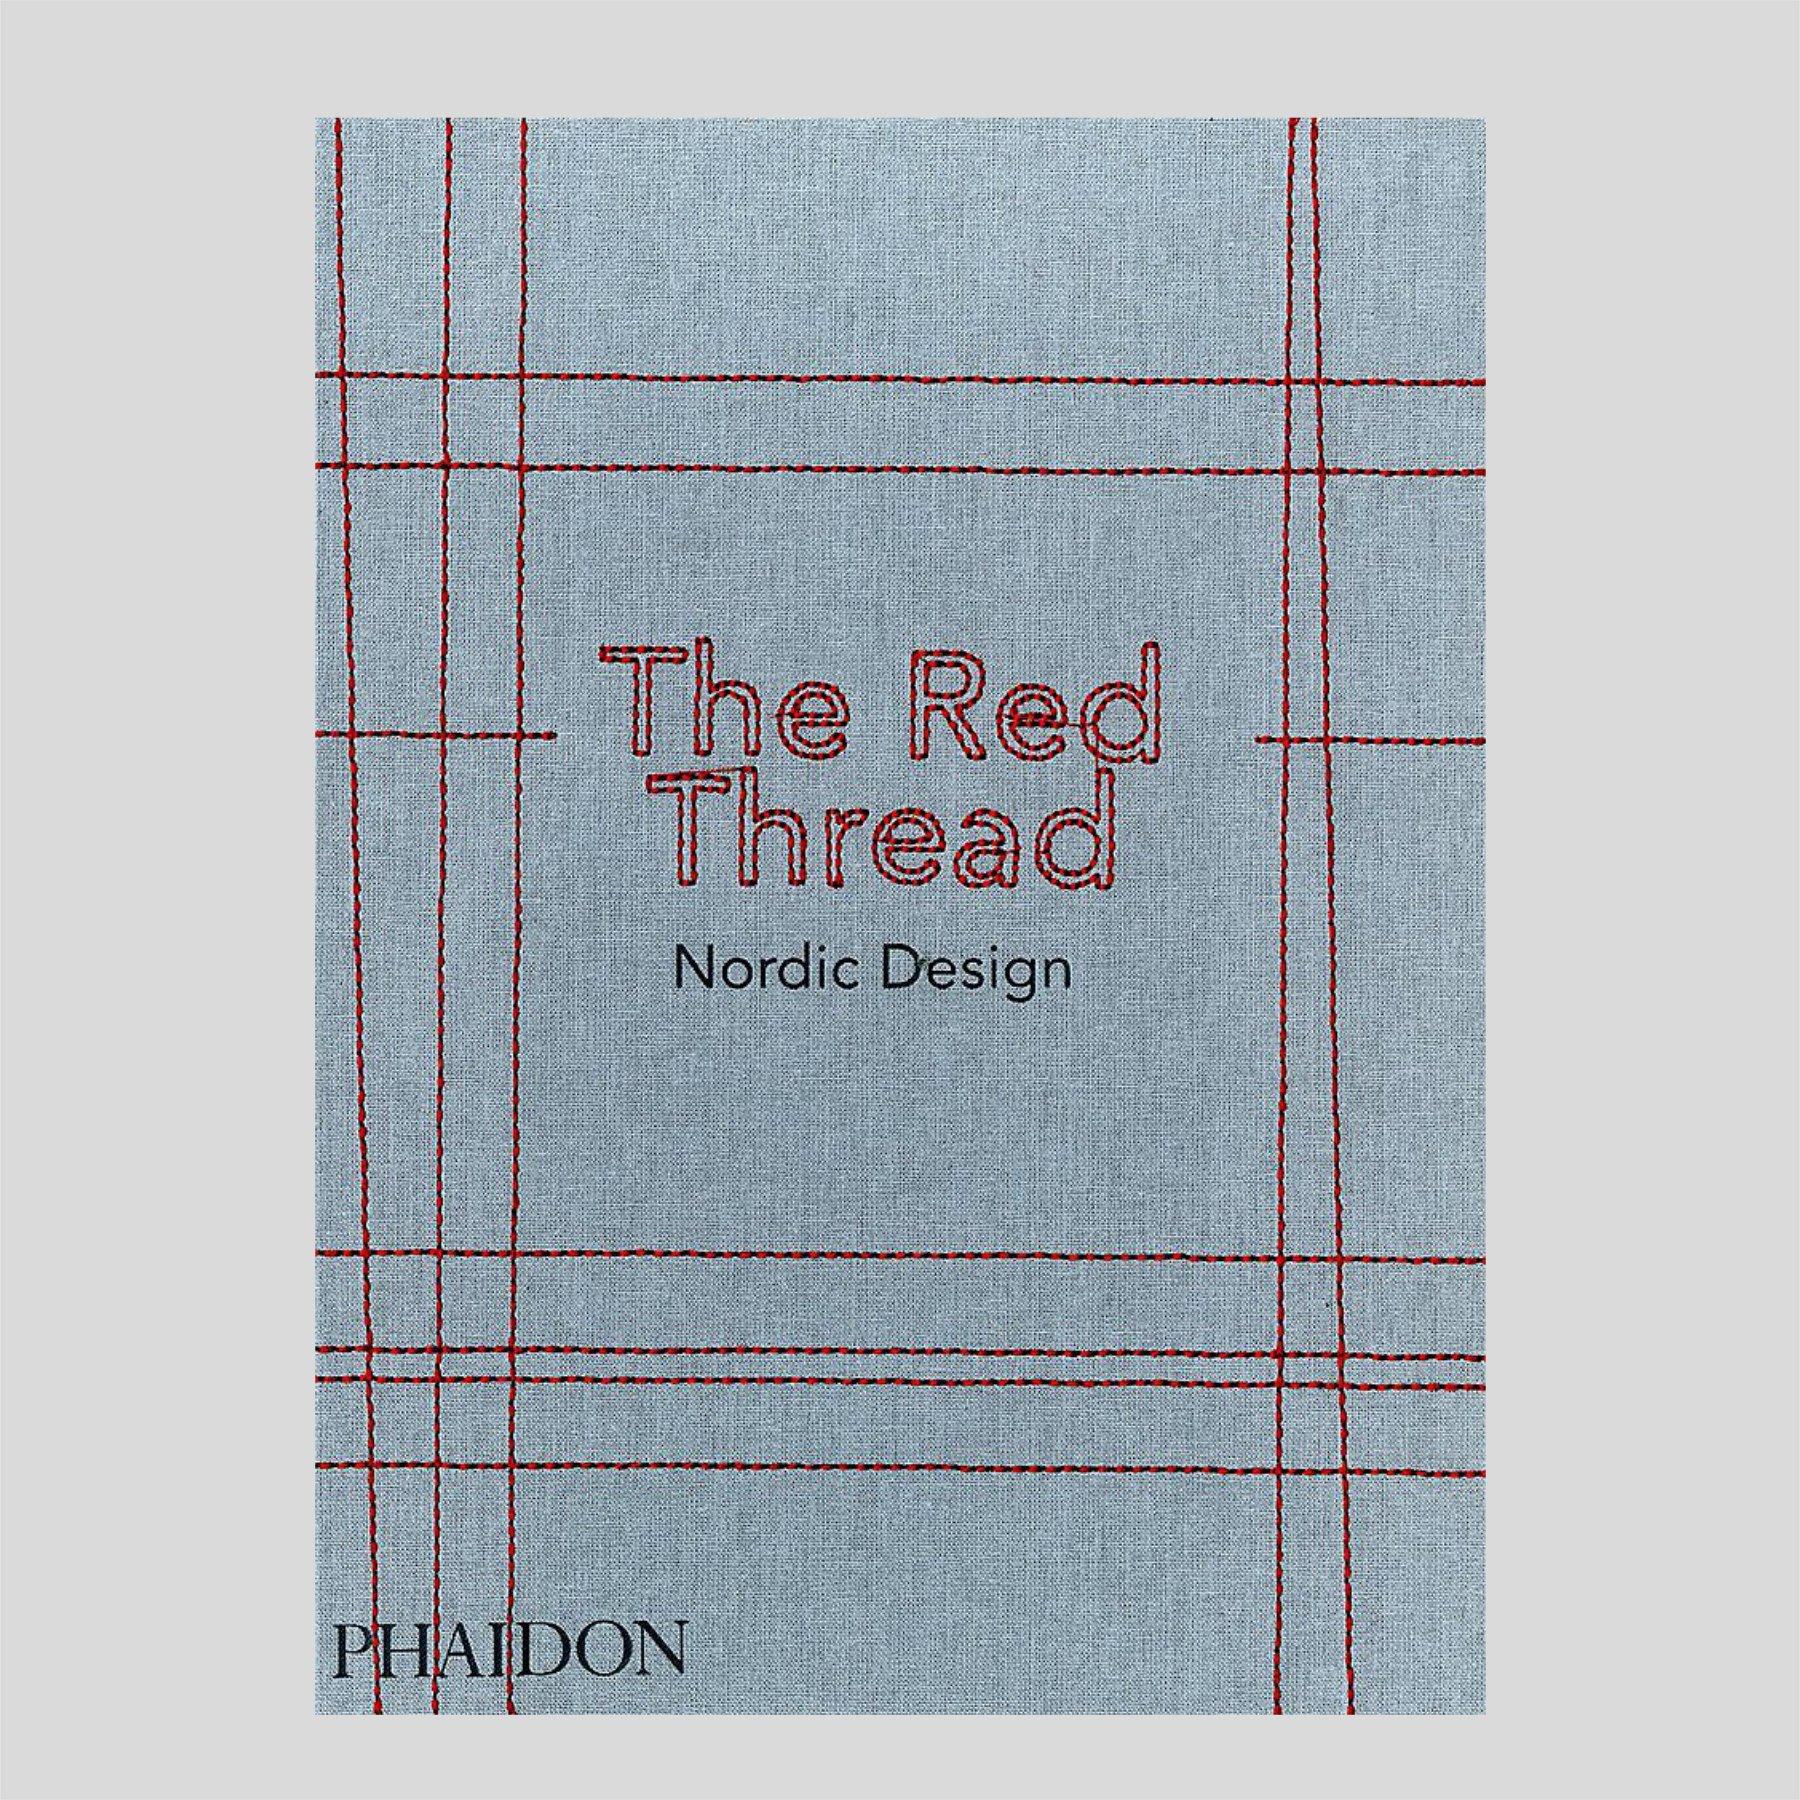 redthread nordic design book home